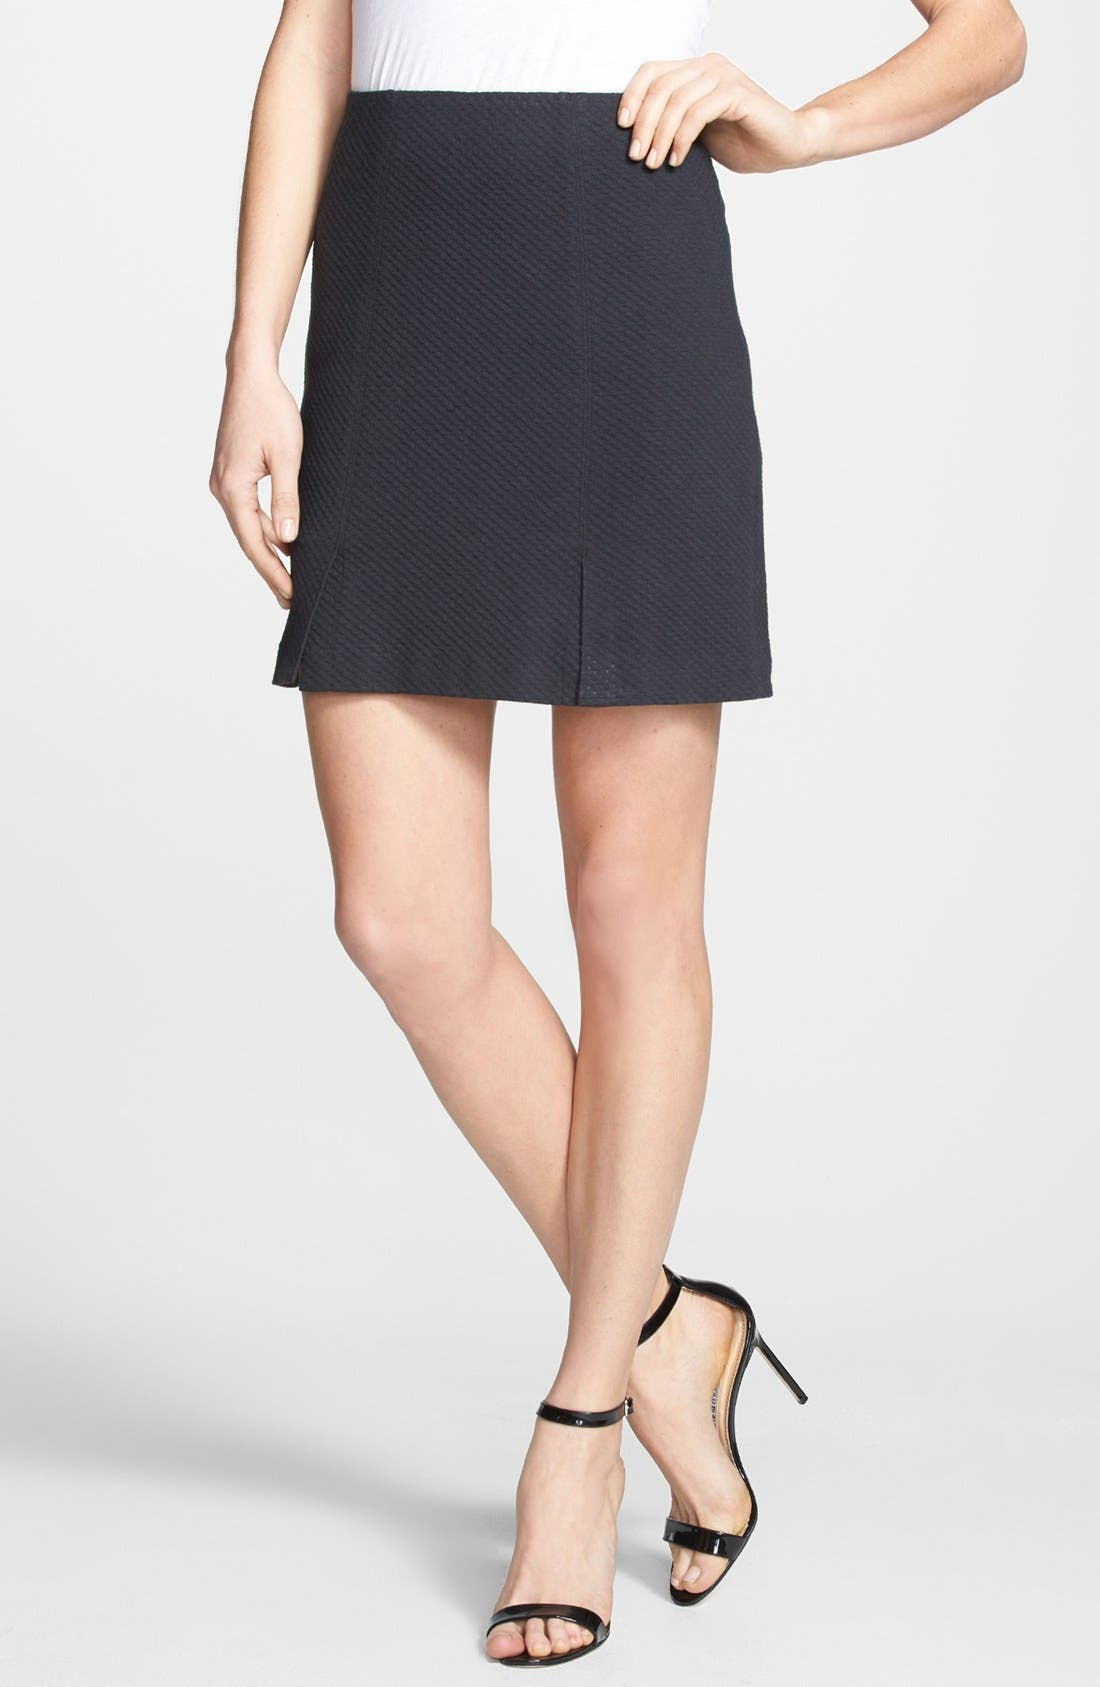 Alternate Image 1 Selected - Rebecca Taylor Textured Skirt